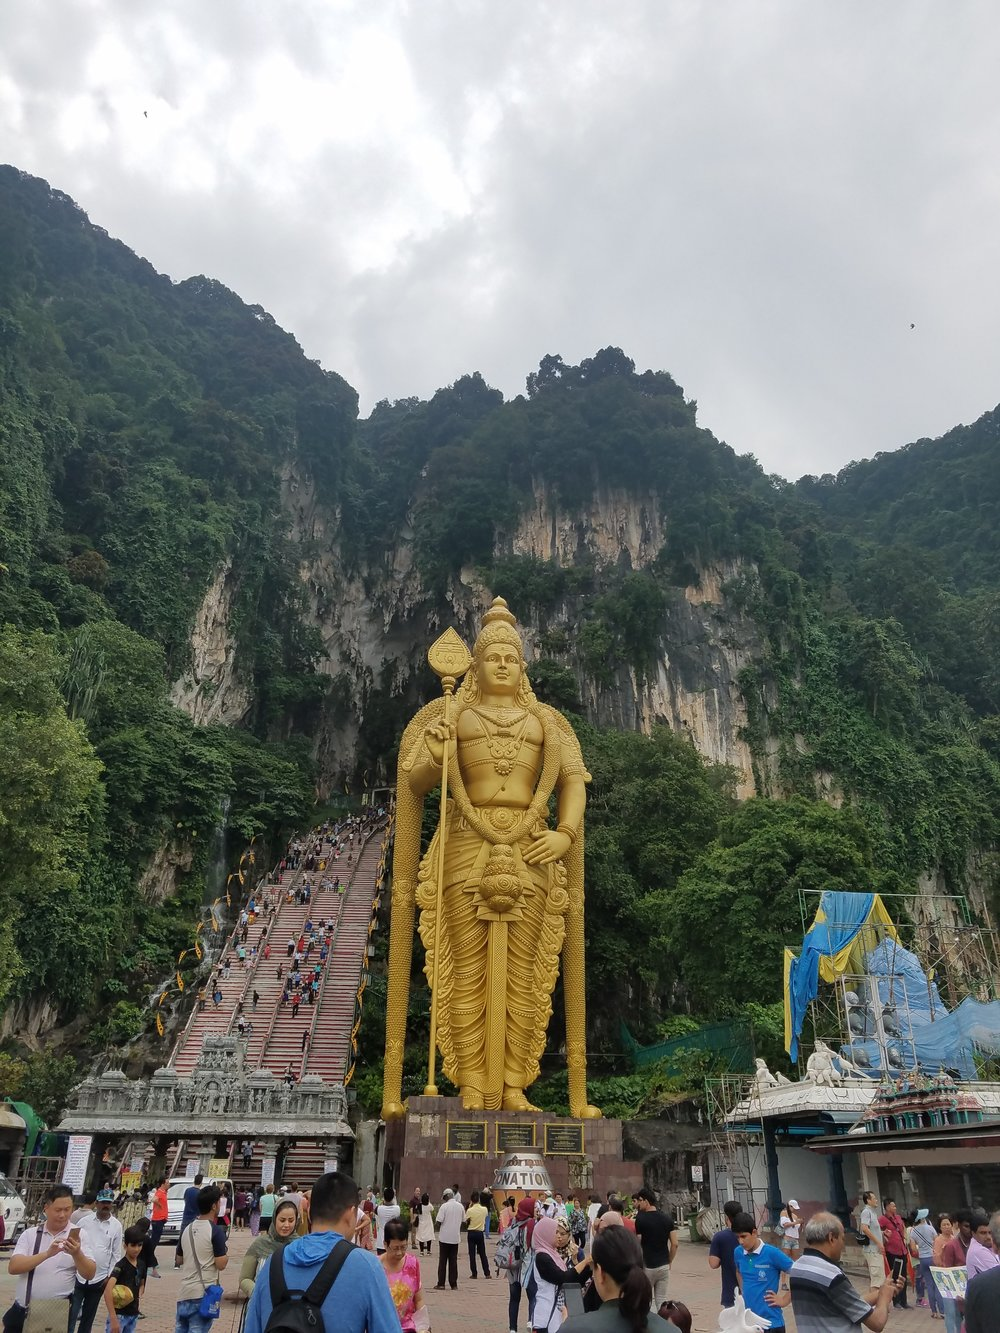 Malaysia_Kuala_Lumpur_Batu_Caves_Backpacktheglobe.jpg